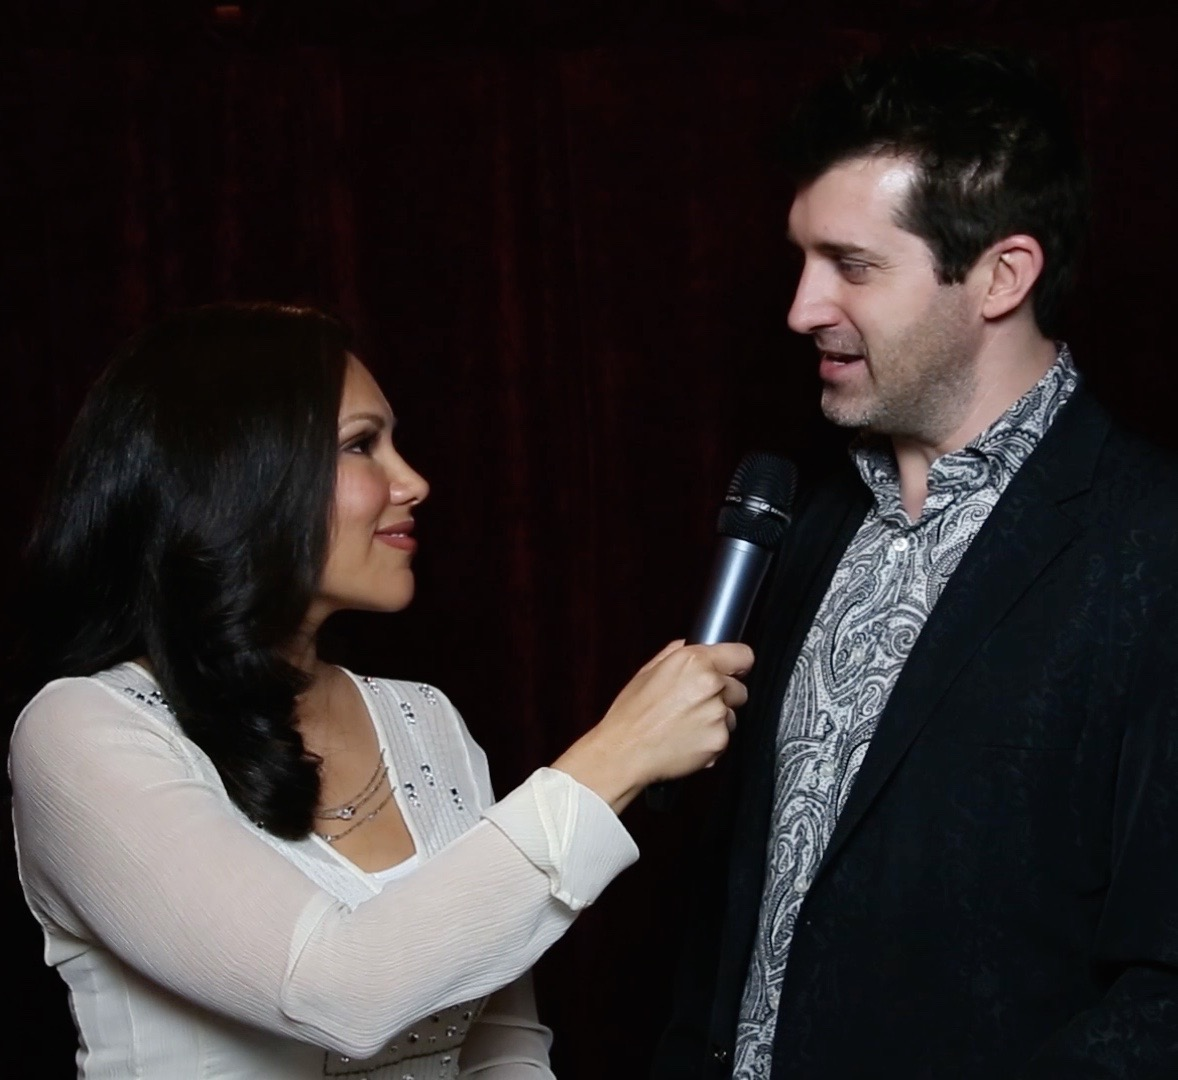 Hypnosis talk with Las Vegas Hypnotist and Hypnotherapist Marc Savard